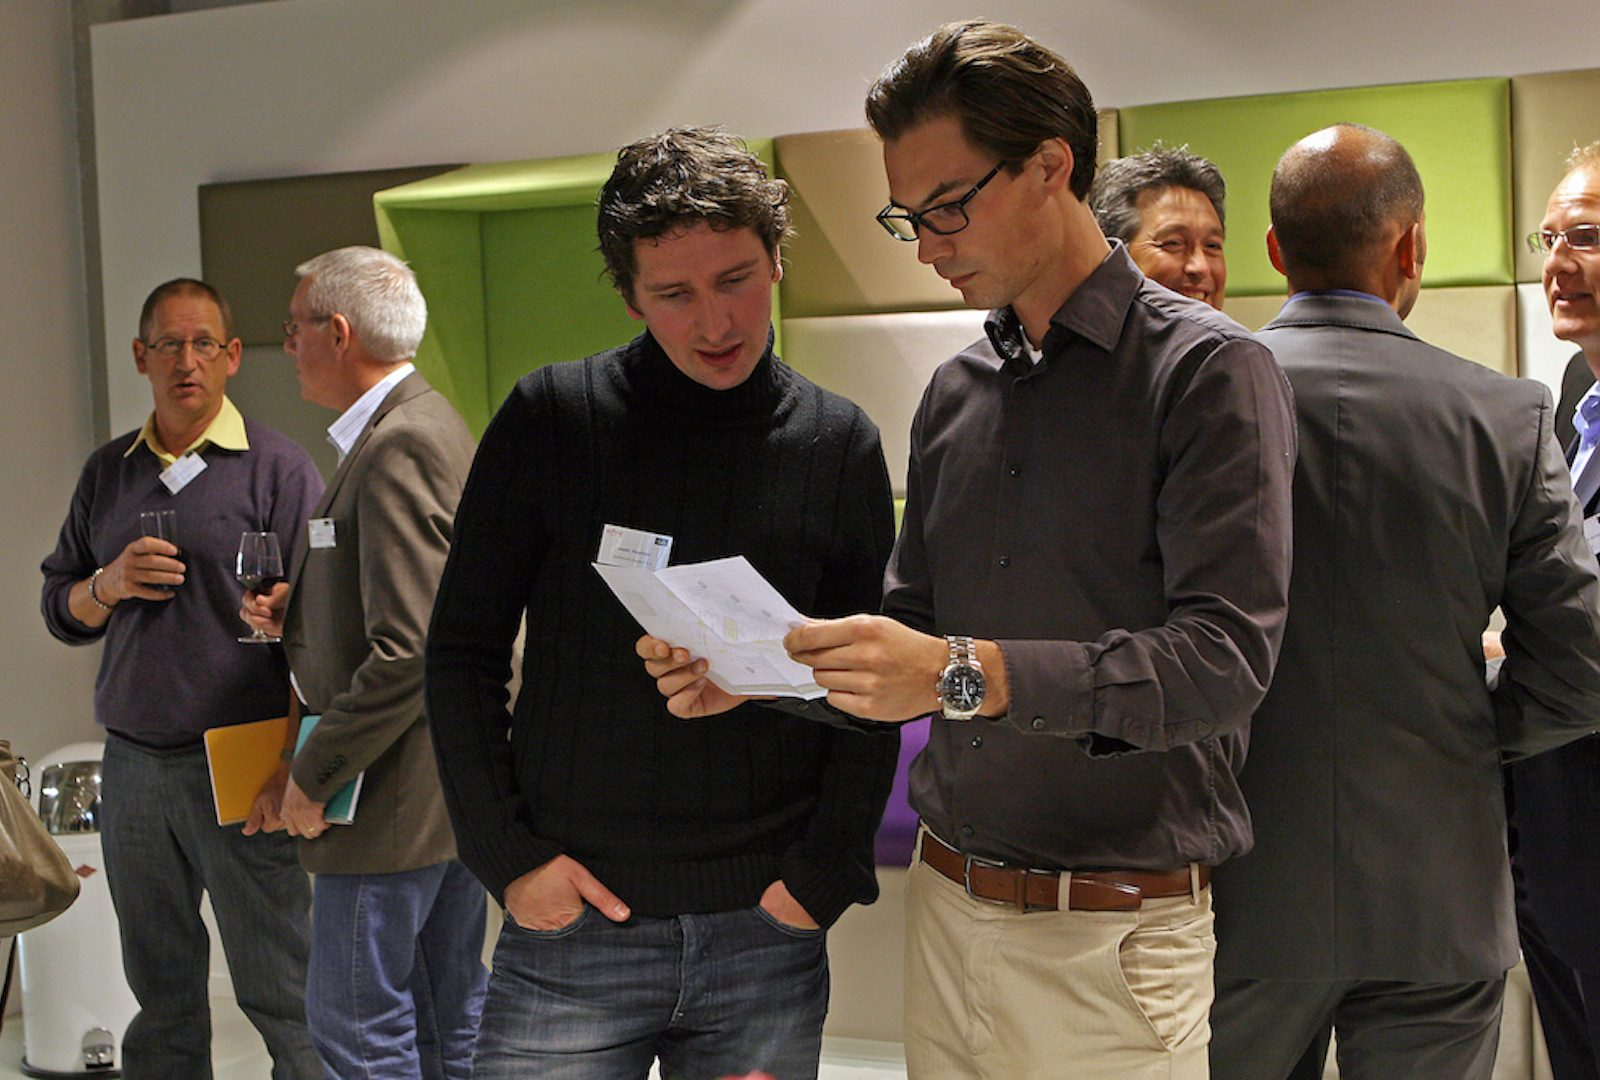 Congres bij Igluu Einhoven